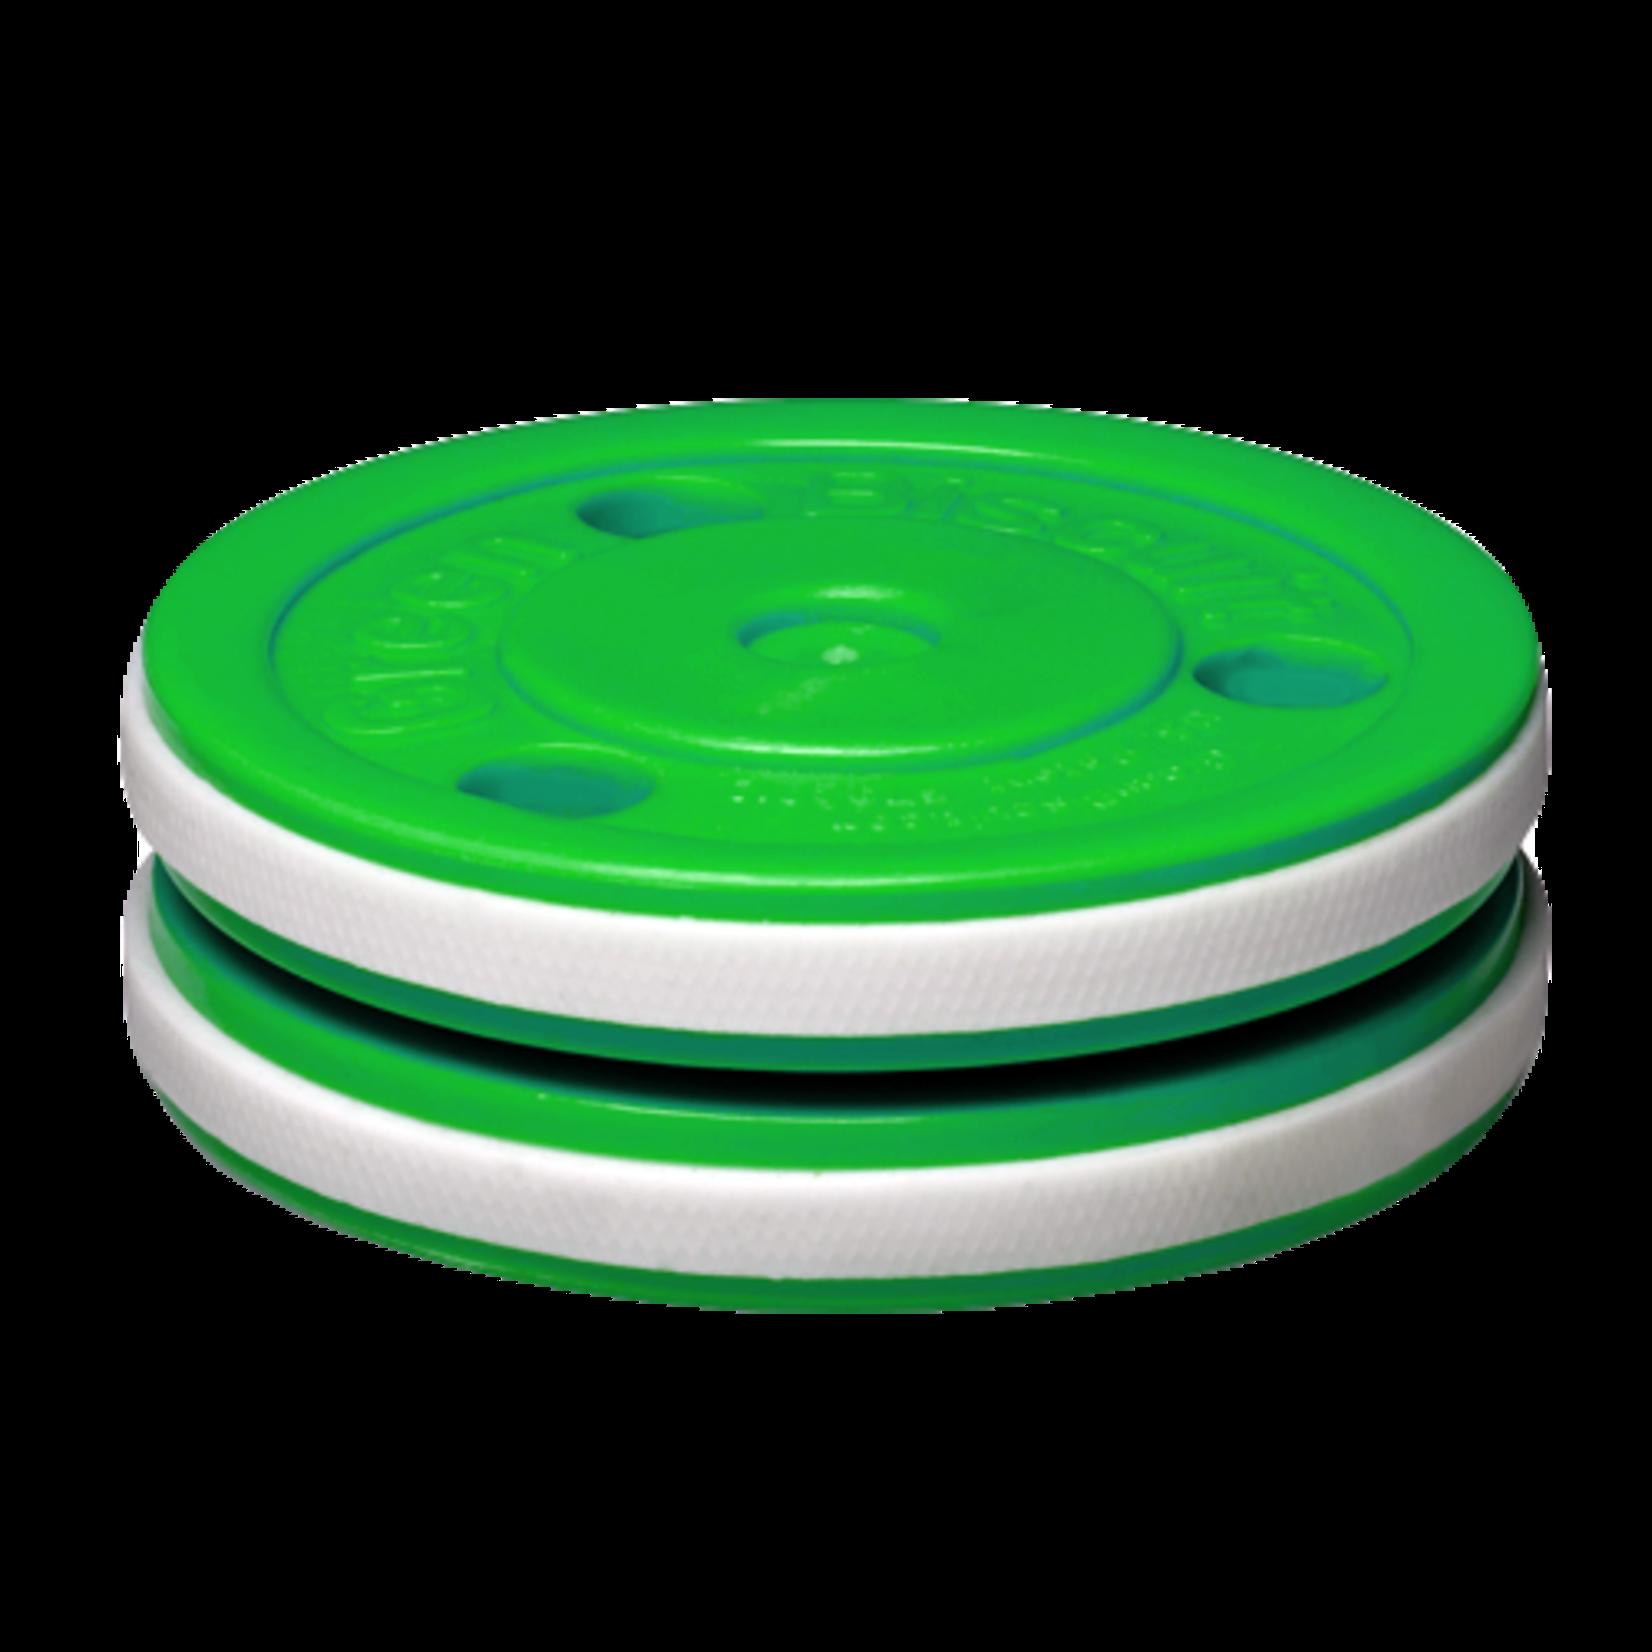 Green Biscuit Hockey Training Puck, Pro